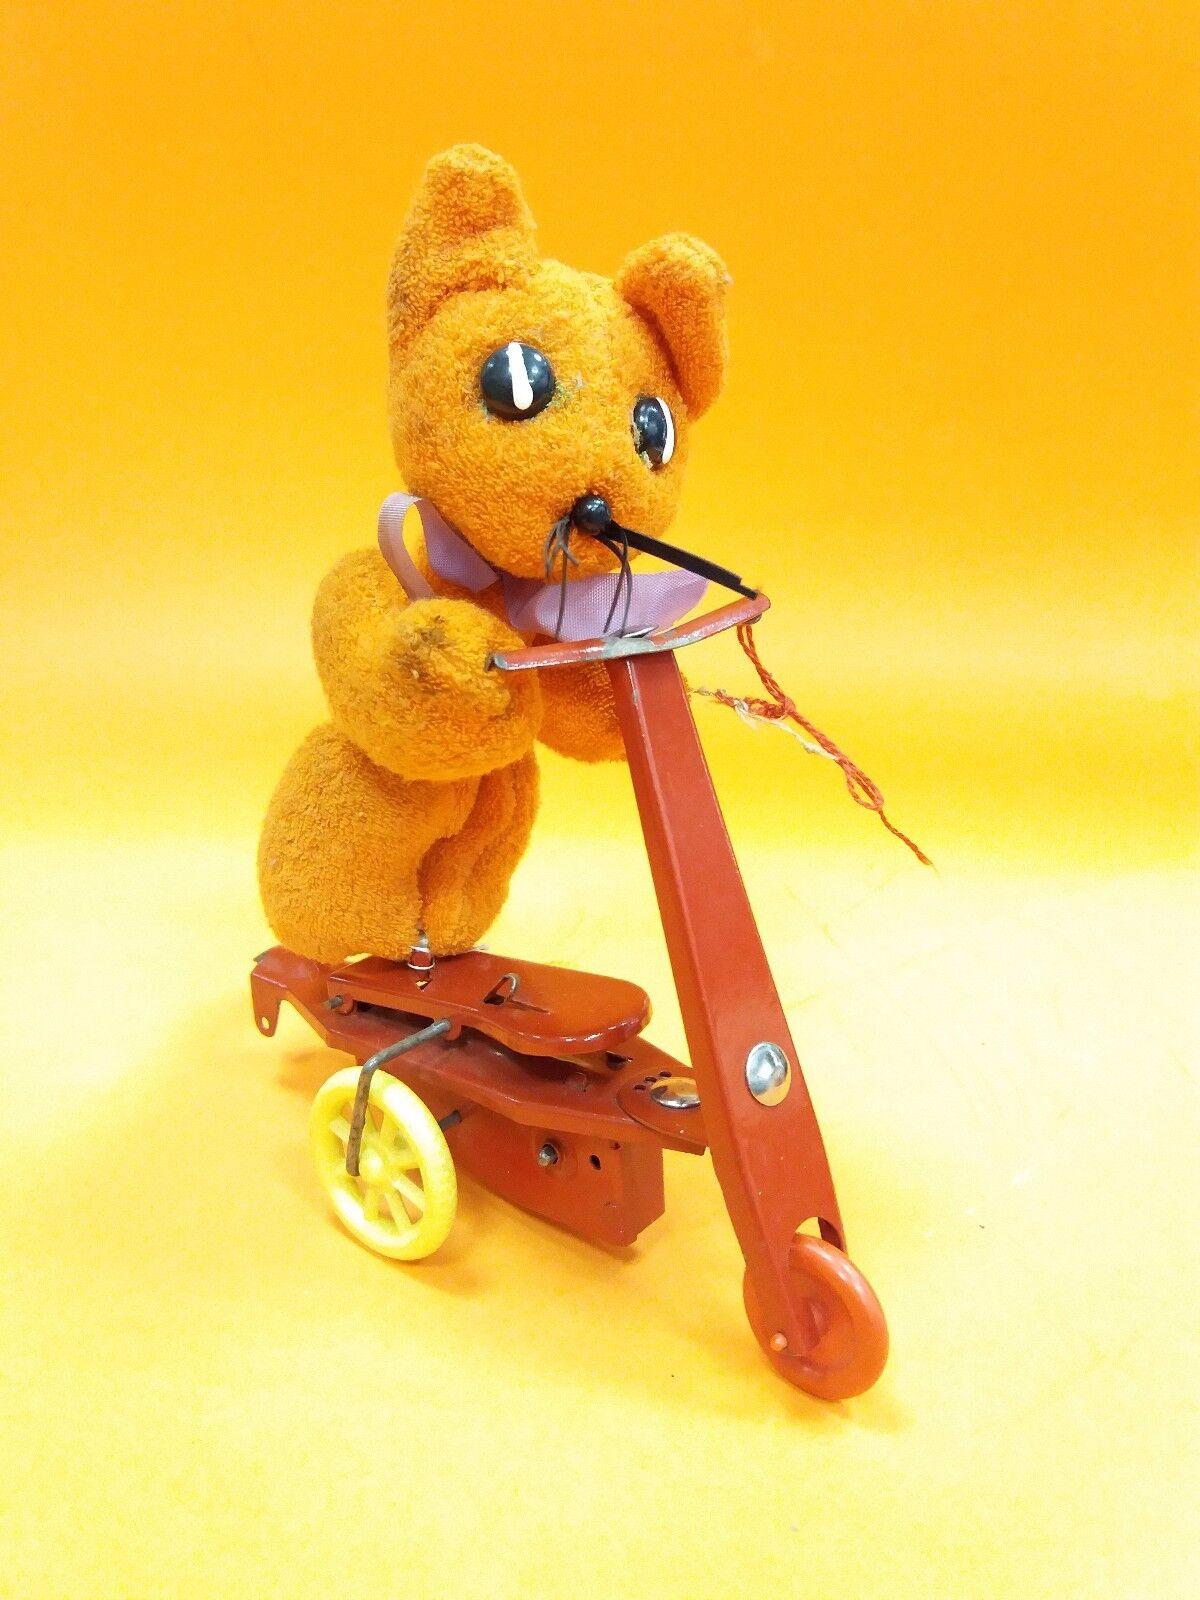 Vintage Antiguo Raro Wind-up mecanismo de estaño Triciclo Scouter Oso De Peluche